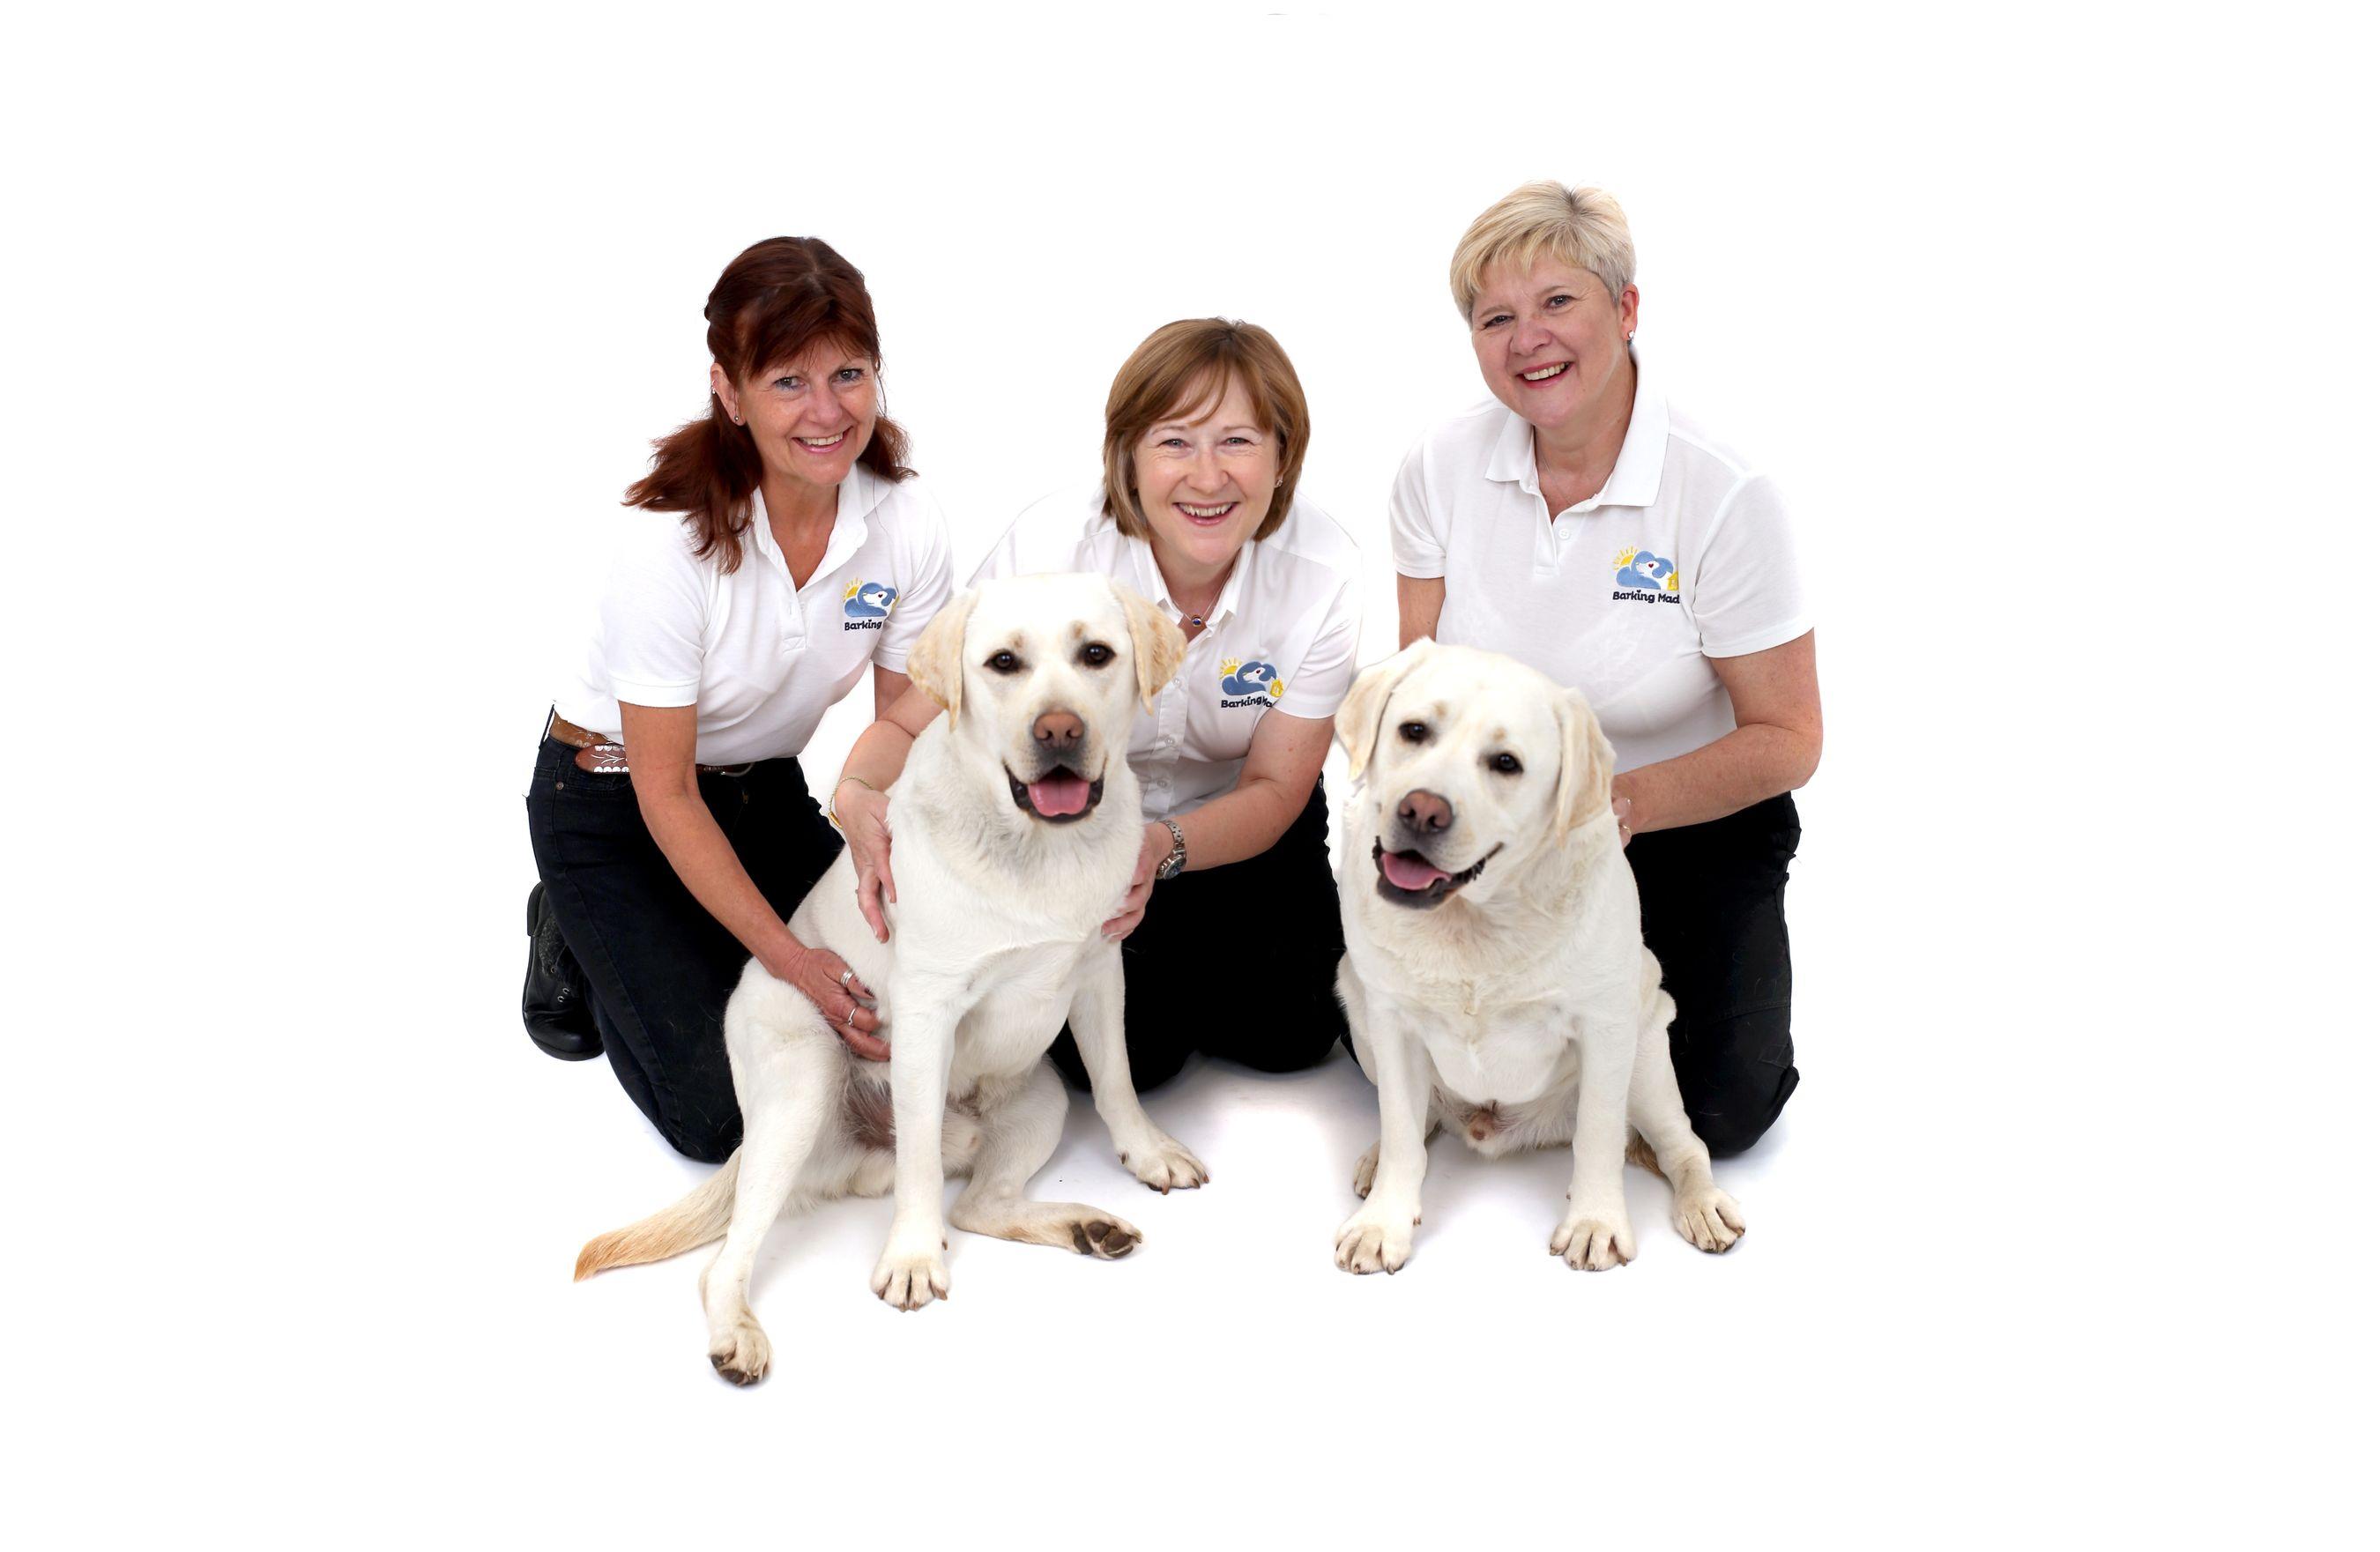 Barking Mad Team Kerry Wells Dog Sitting Labrador (1)